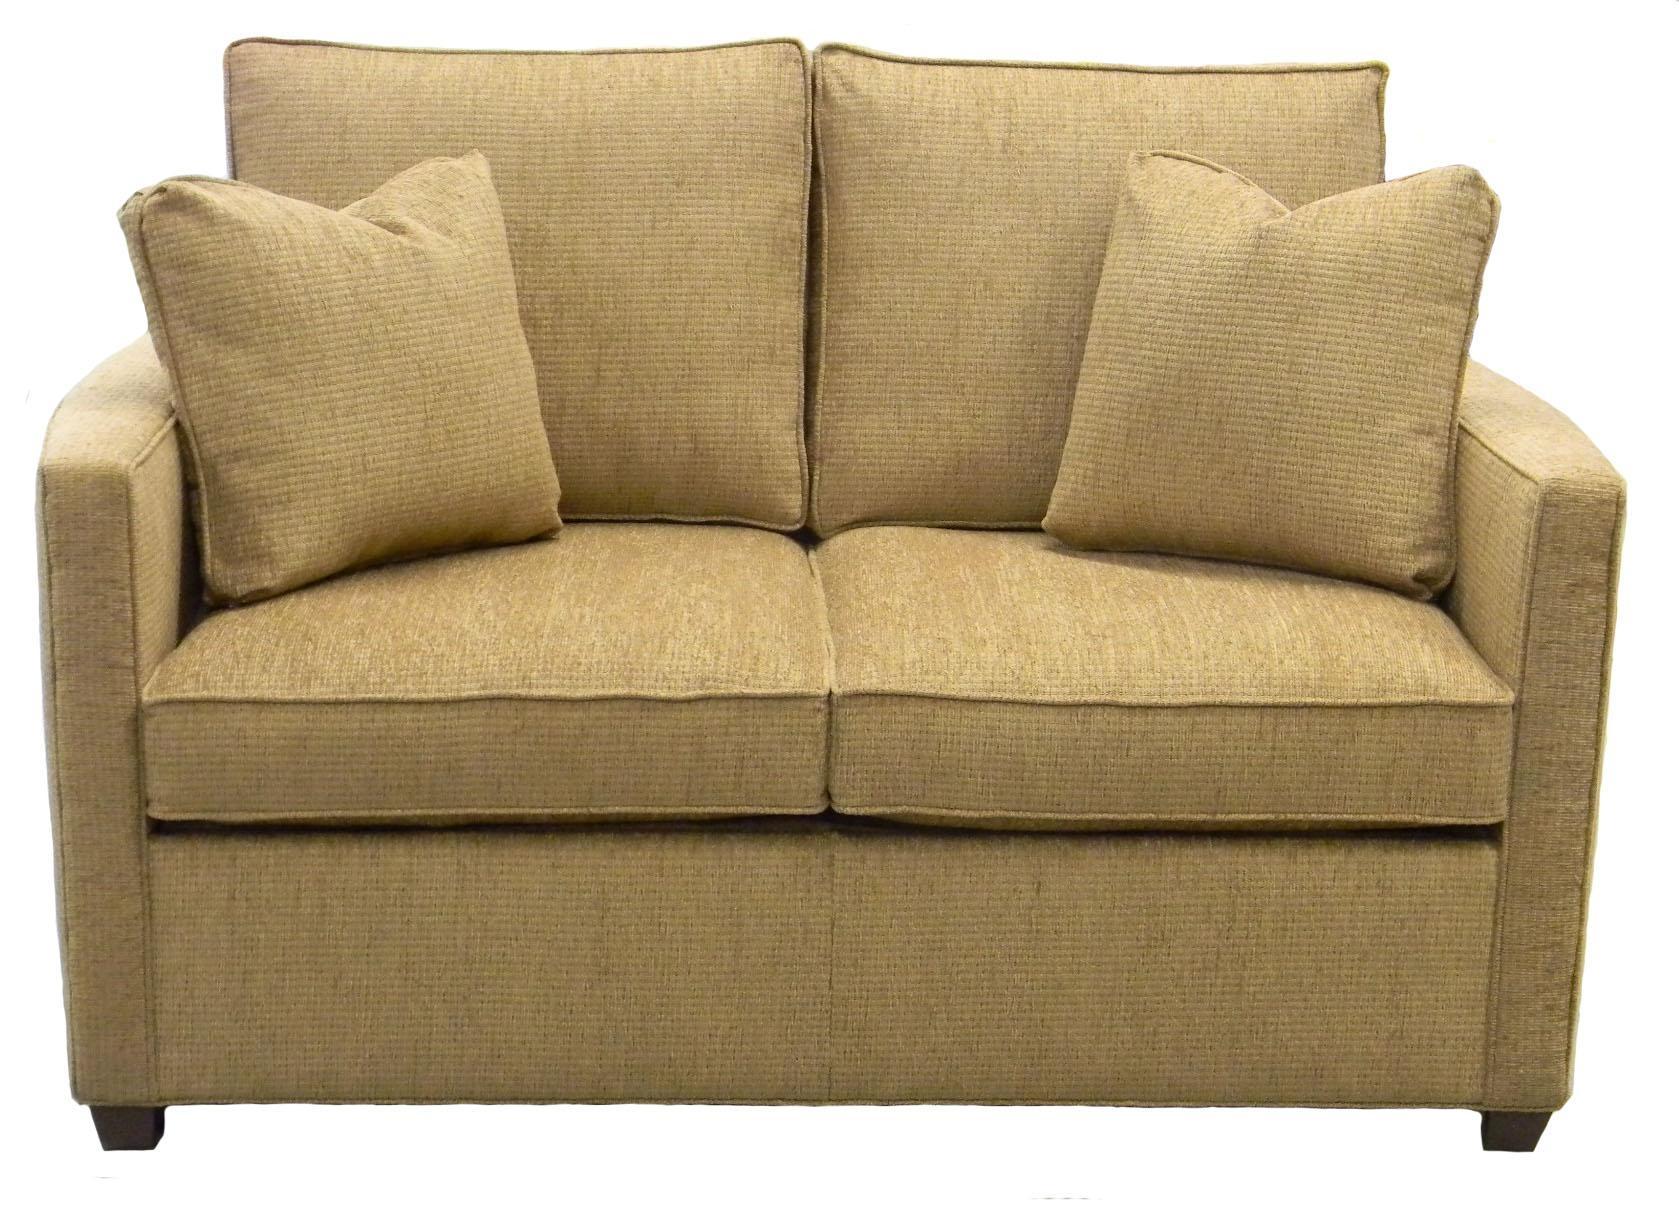 Jennings Twin Sleeper Sofa Carolina Chair Made Usa Nc Free Shipping in Twin Sleeper Sofa Chairs